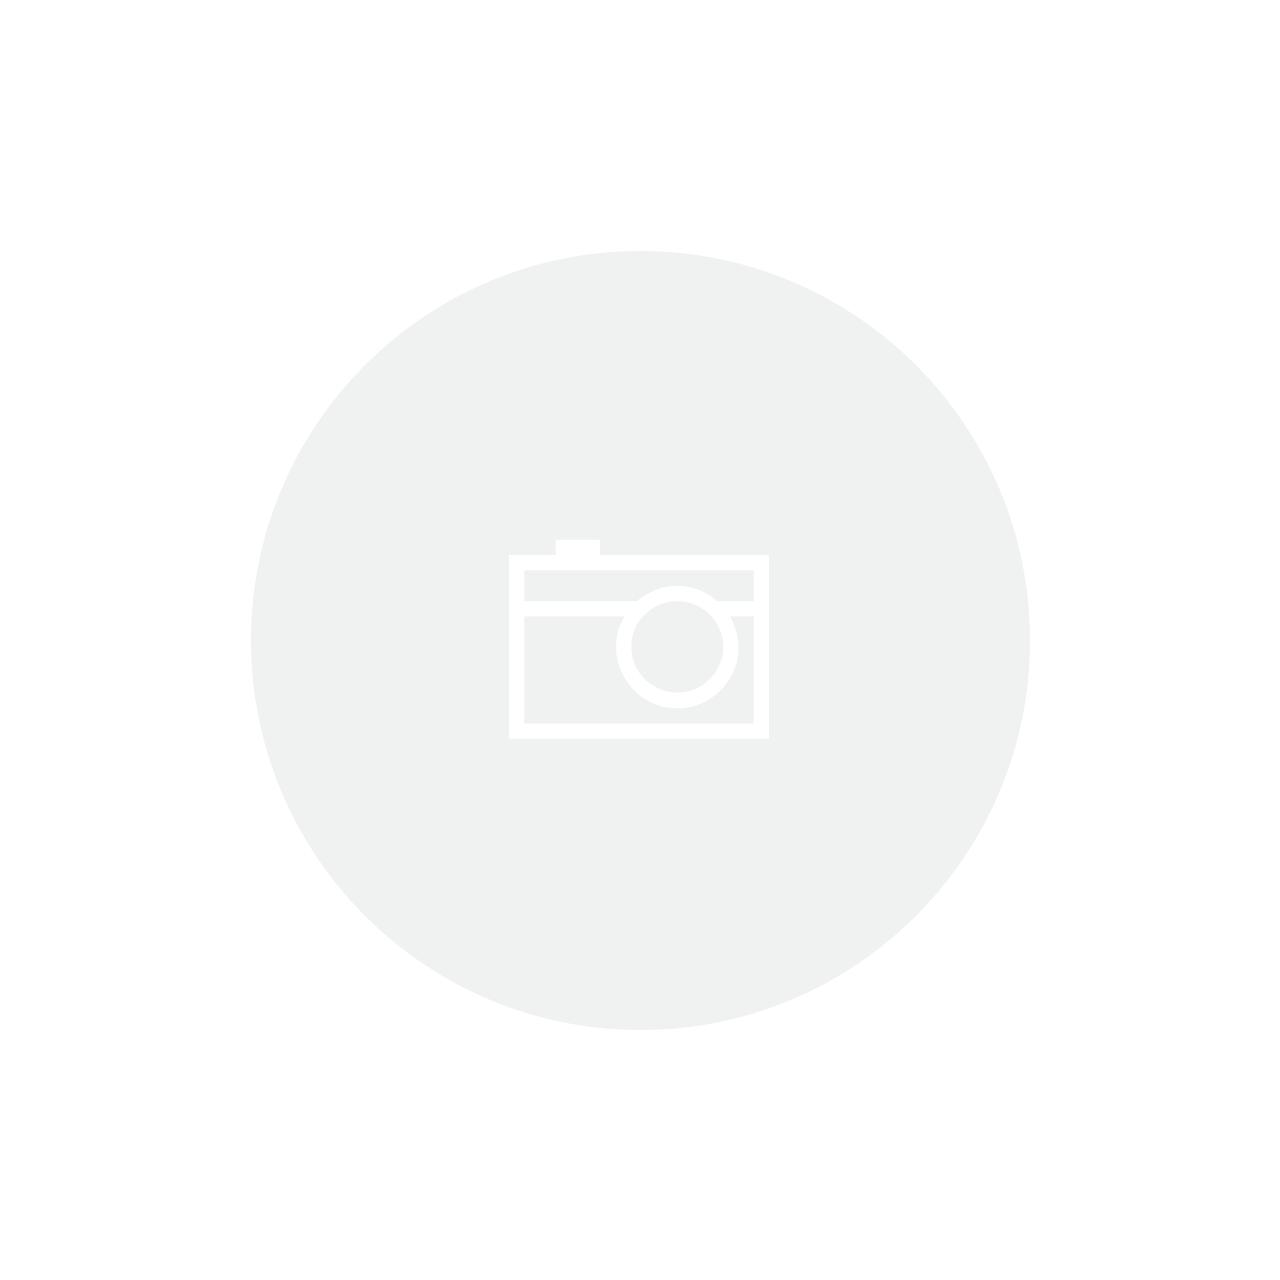 Papel Artesanal Indiano - Ref. 39